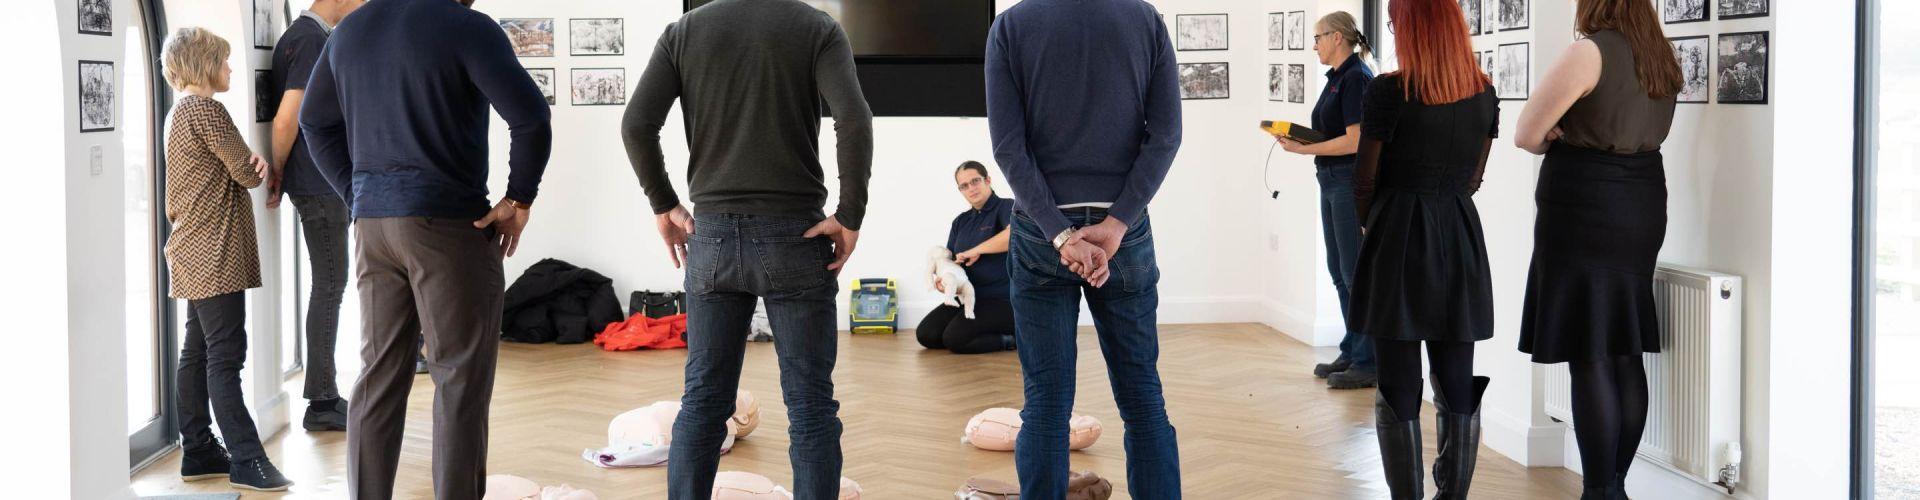 Case study Defibrillator awareness training atHoulton_Banner.jpg